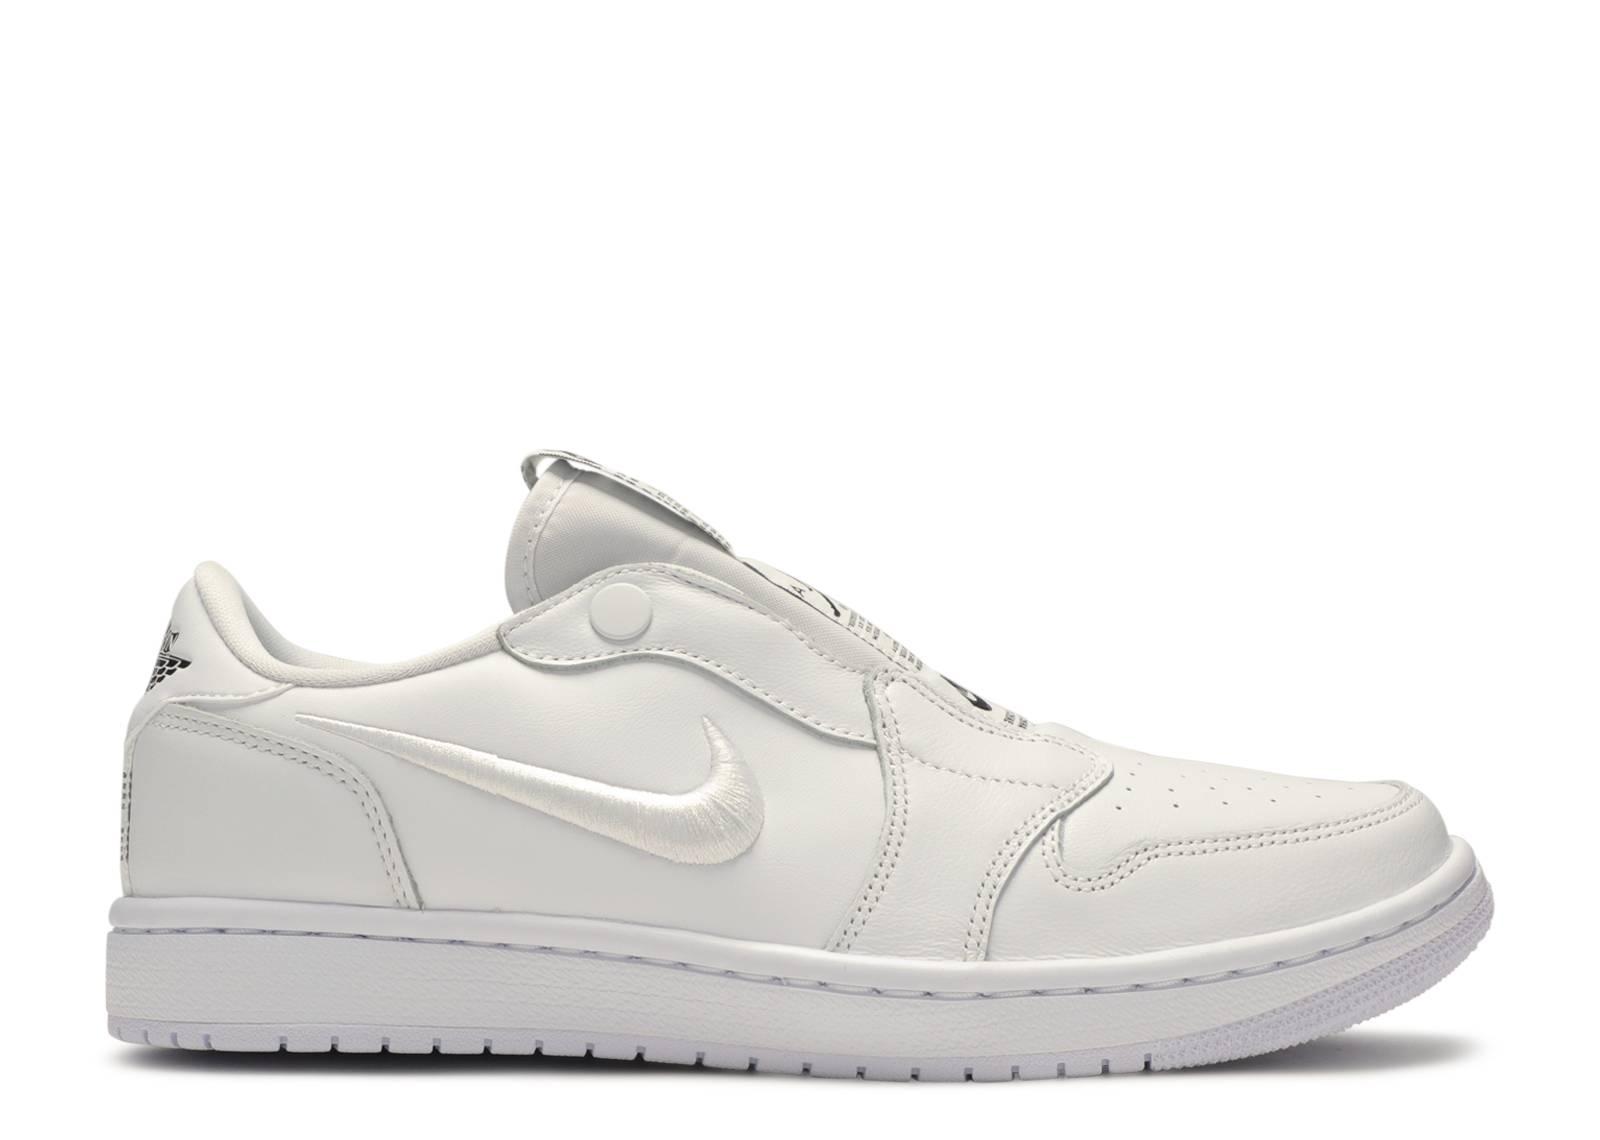 Wmns Air Jordan 1 Retro Low Slip 'White'